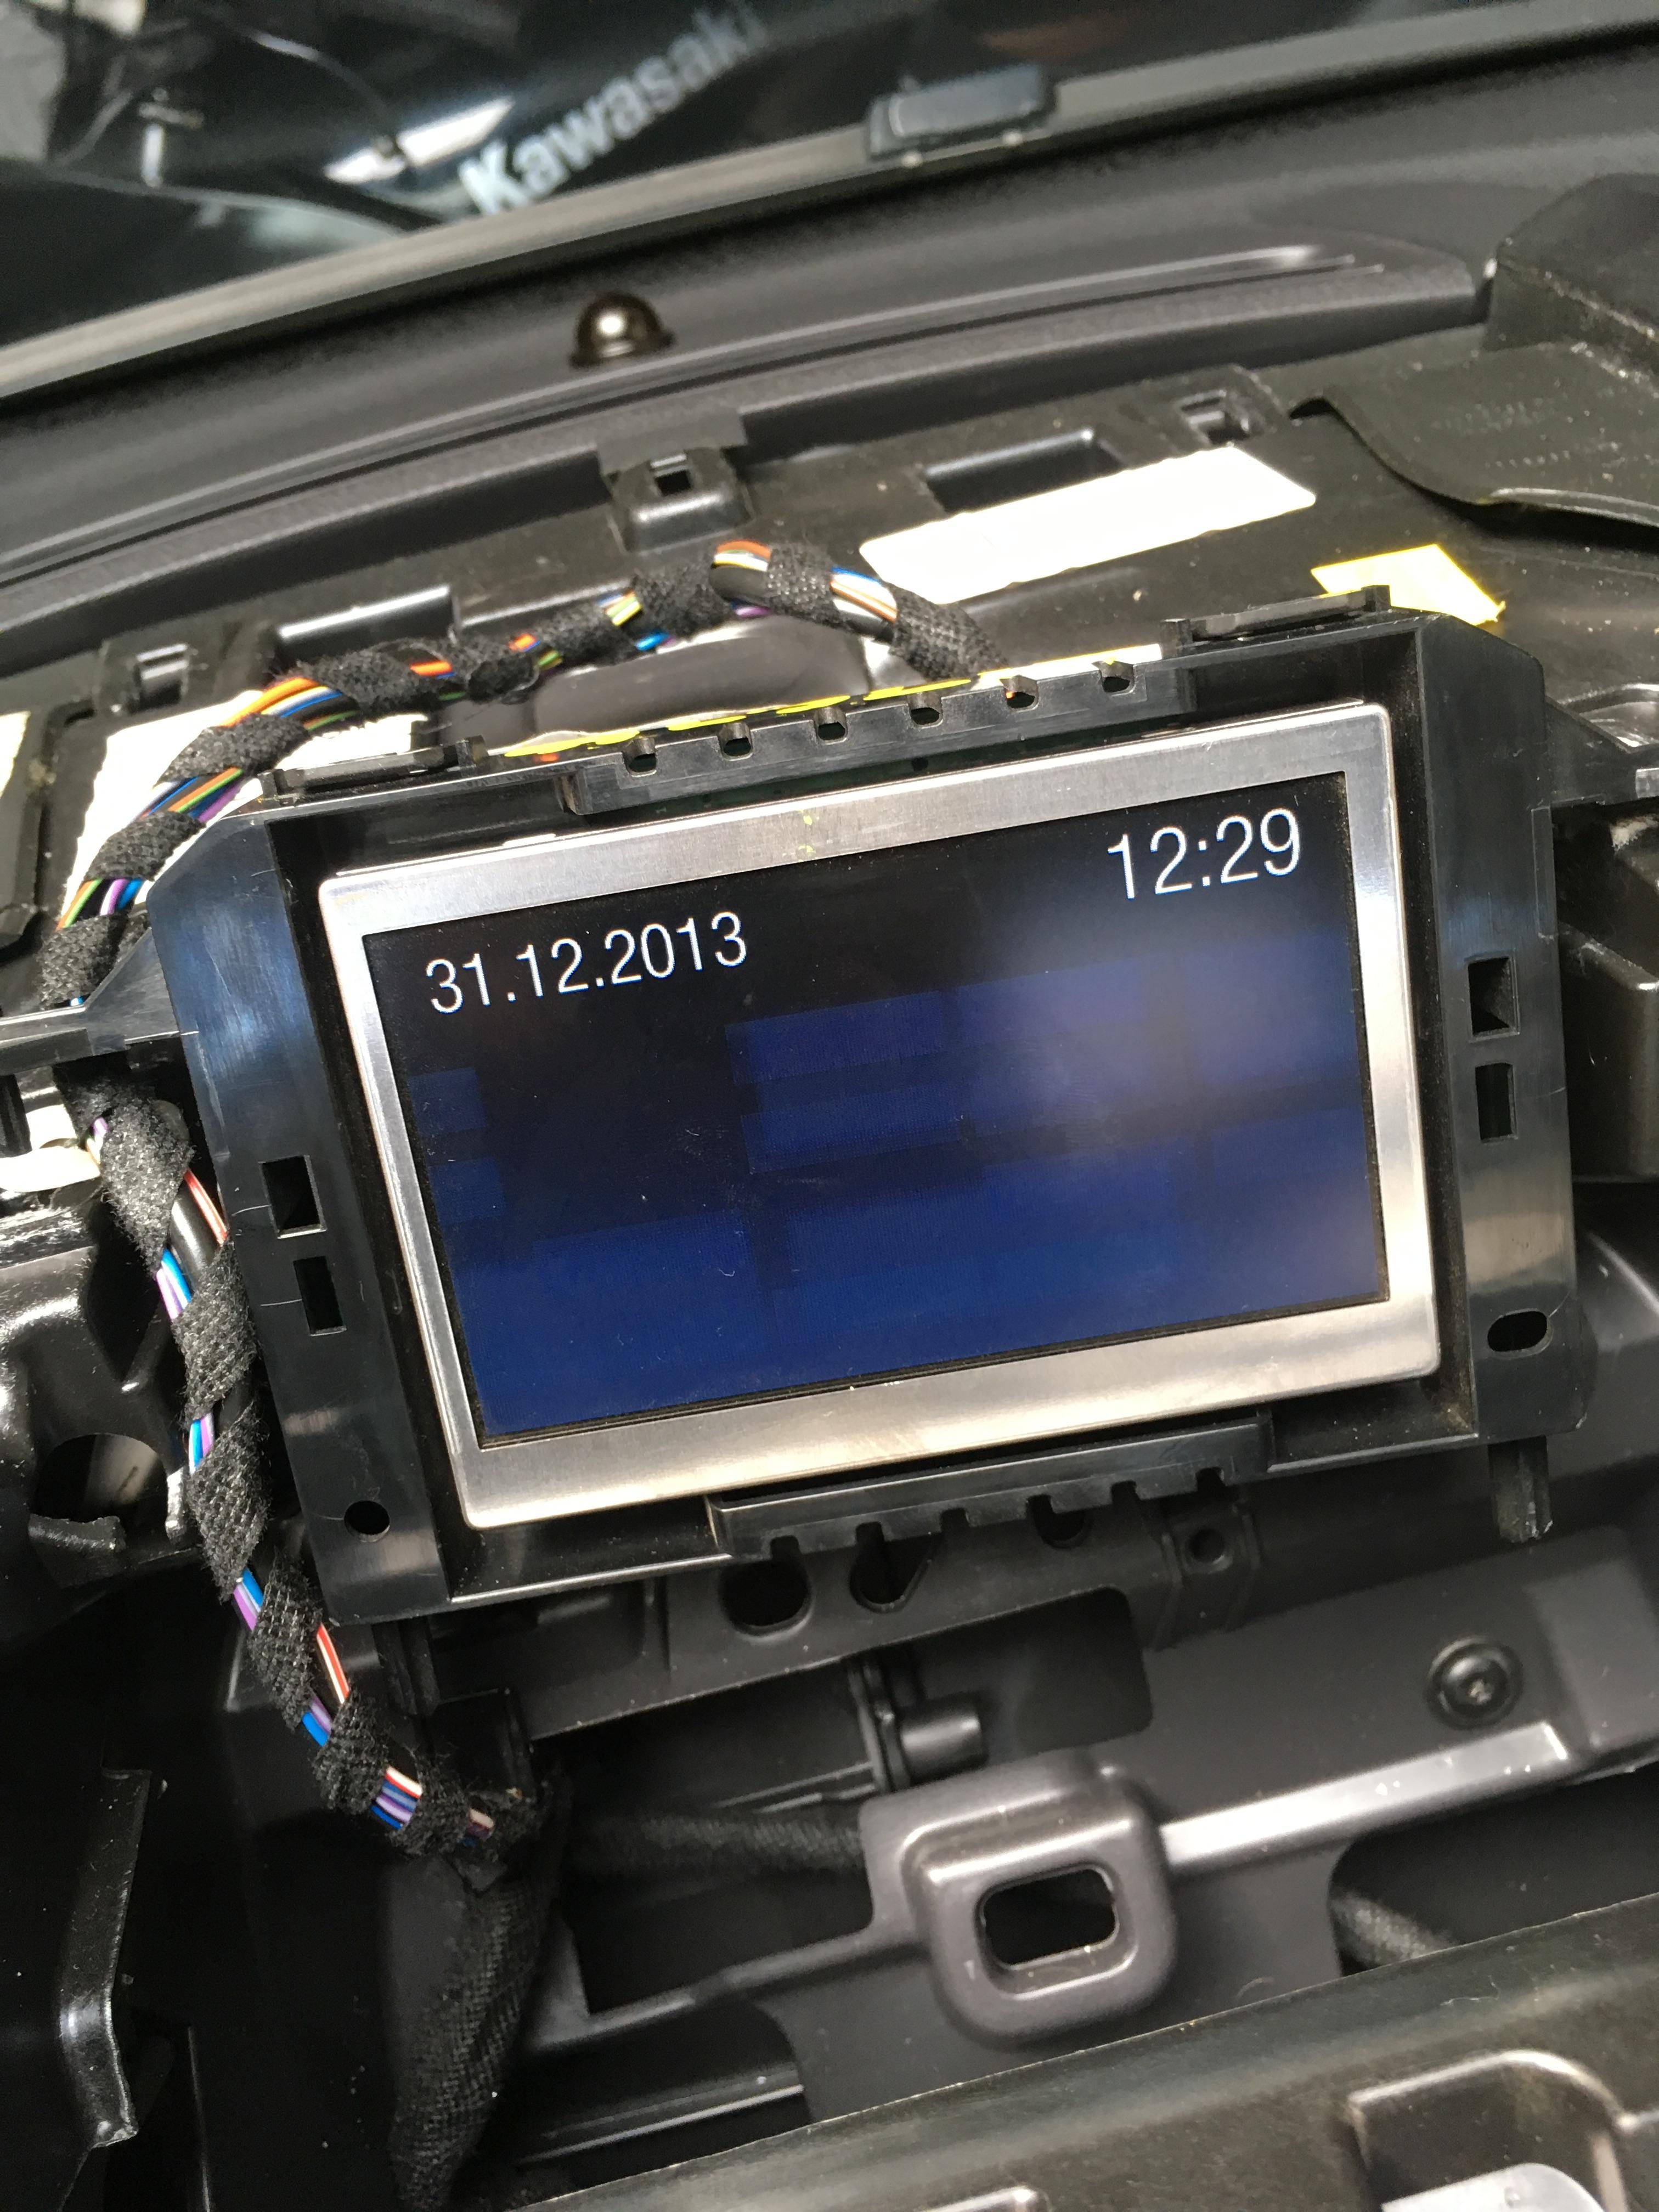 Ford Fiesta Wiring Diagram 2014 Ford Fiesta Car Stereo Wiring